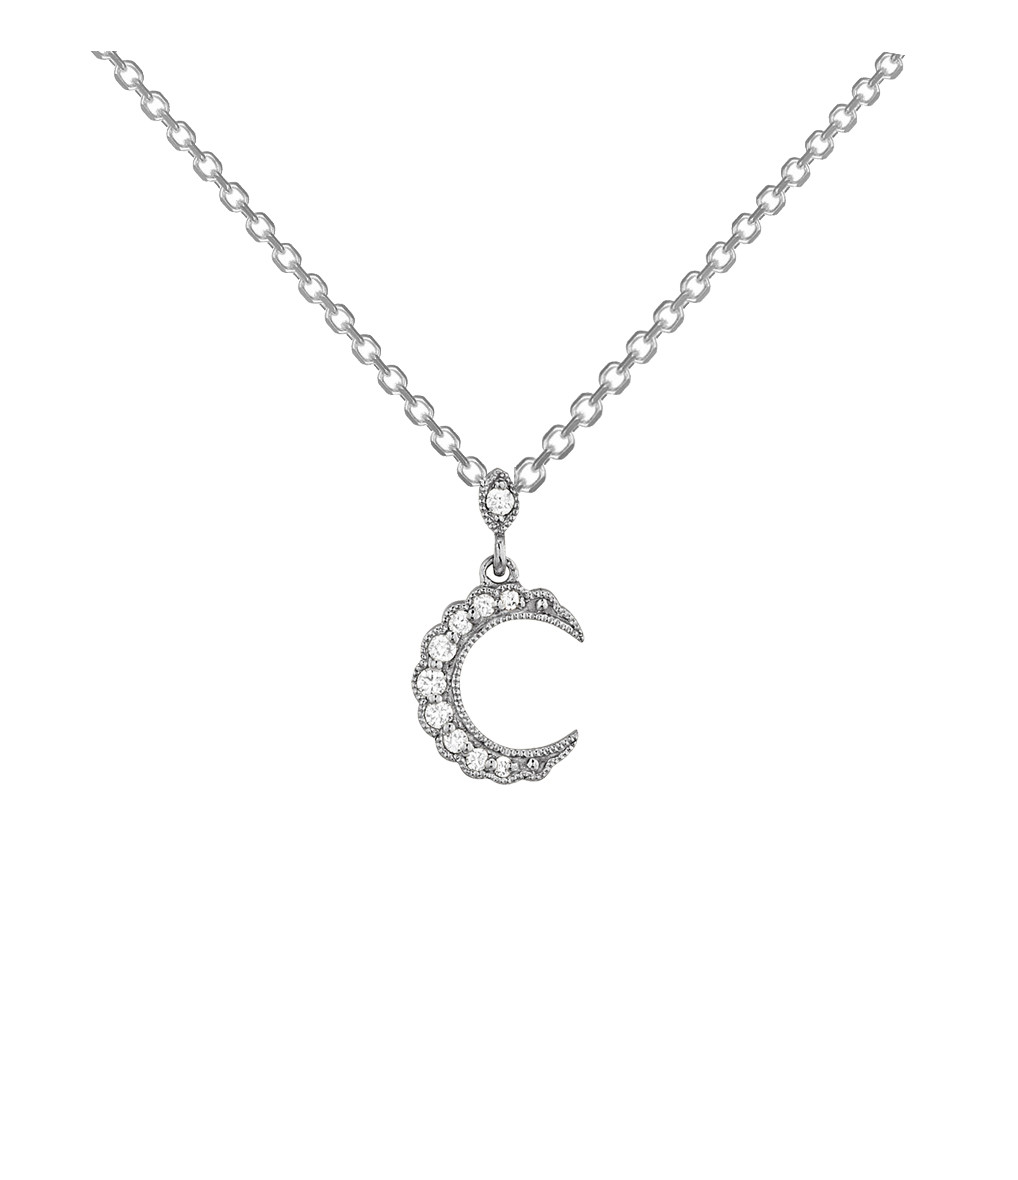 STONE PARIS - Collier Moonlight Or Diamants